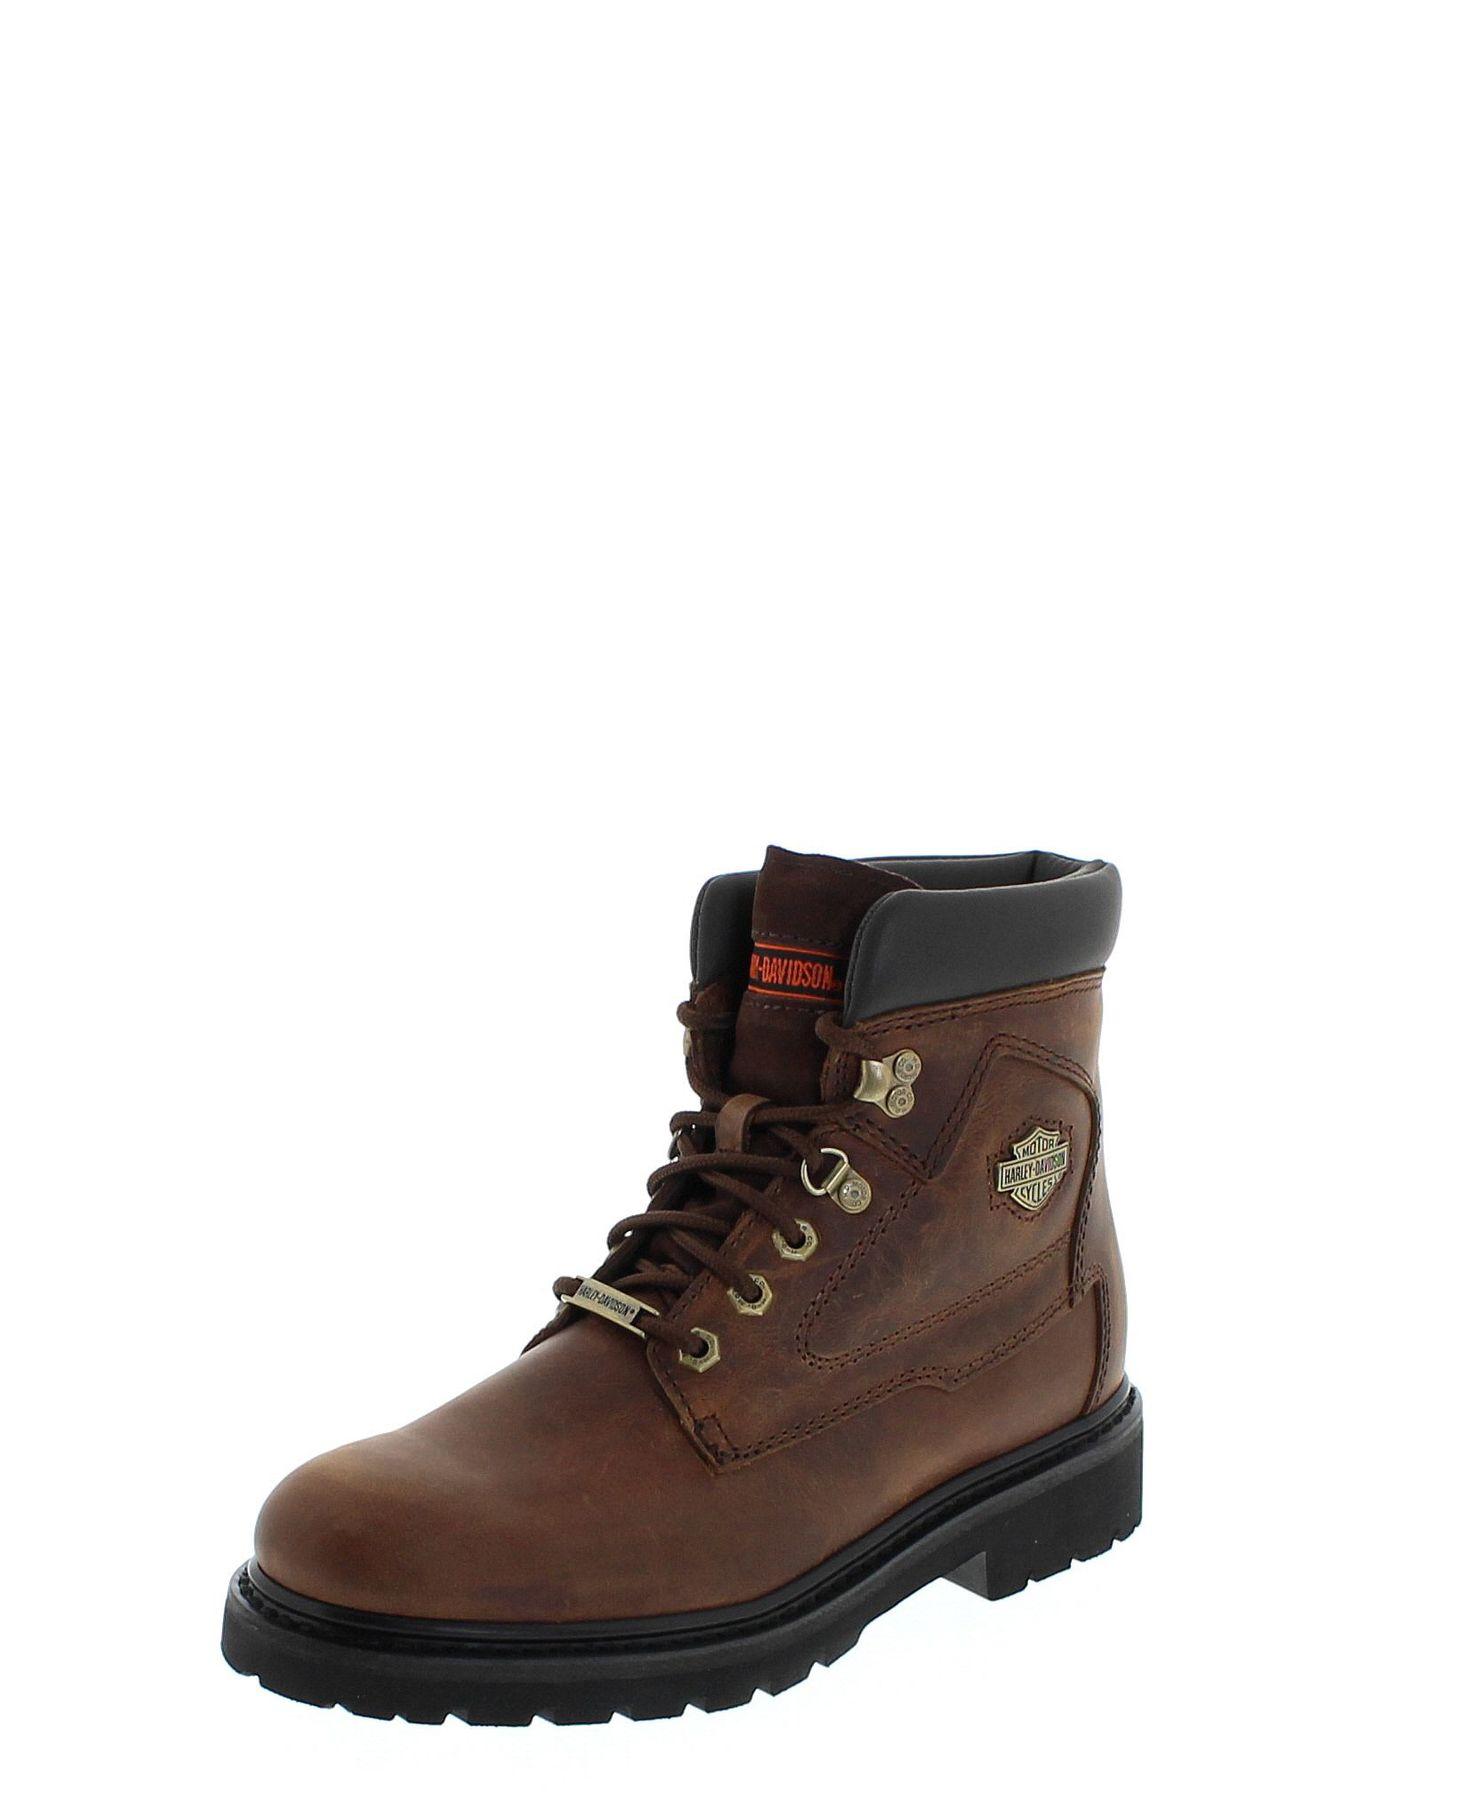 Harley Davidson Men-boots Bayport d93365-Brown